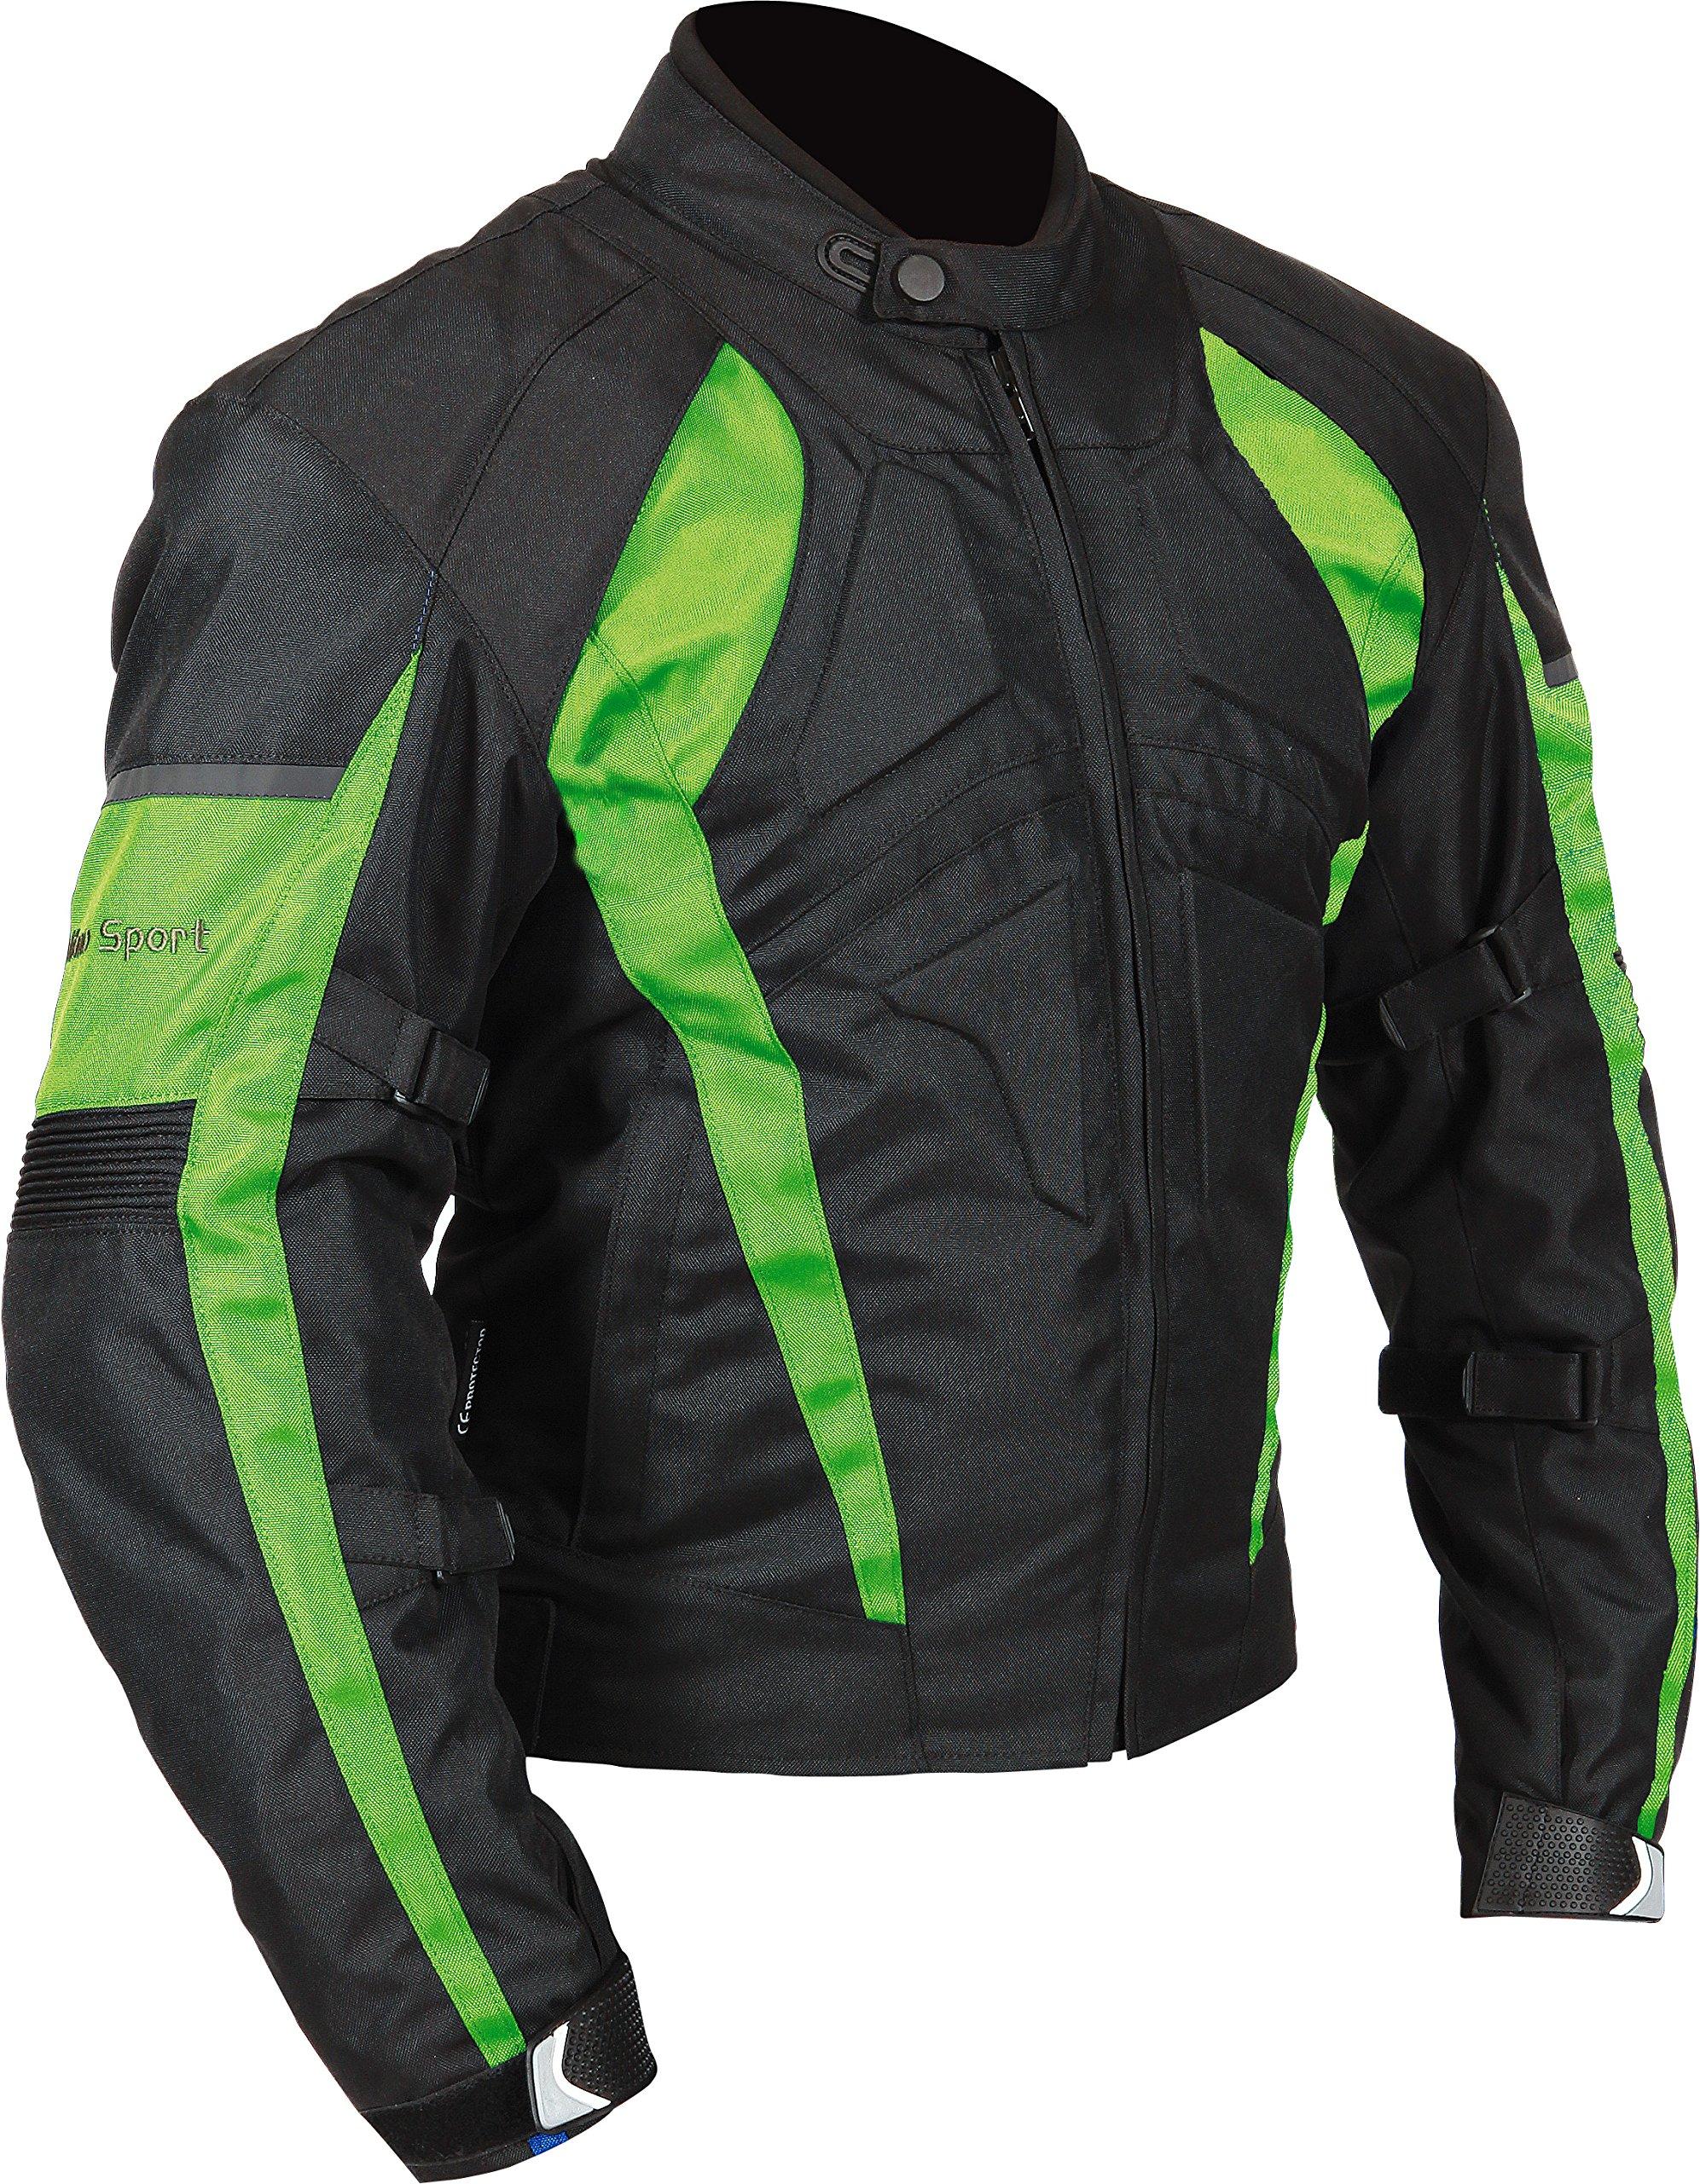 Milano Sport Gamma Men's Motorcycle Jacket (Black/Green, Small)